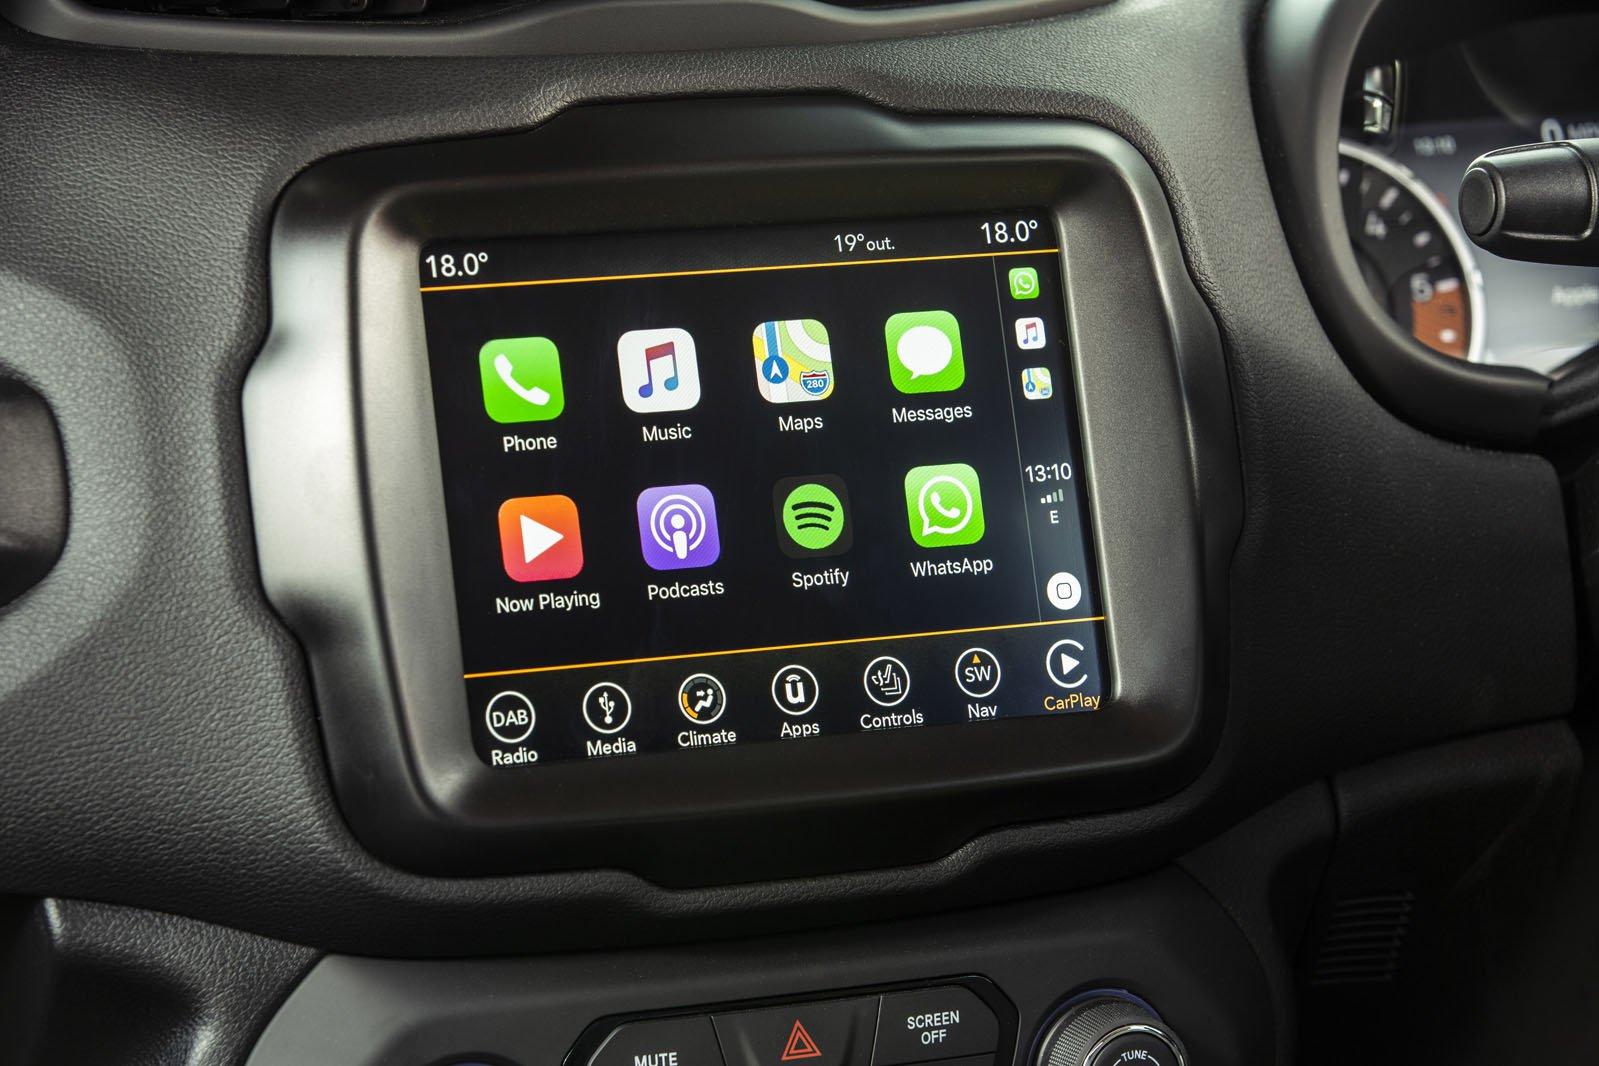 Jeep Renegade 2018 infotainment RHD